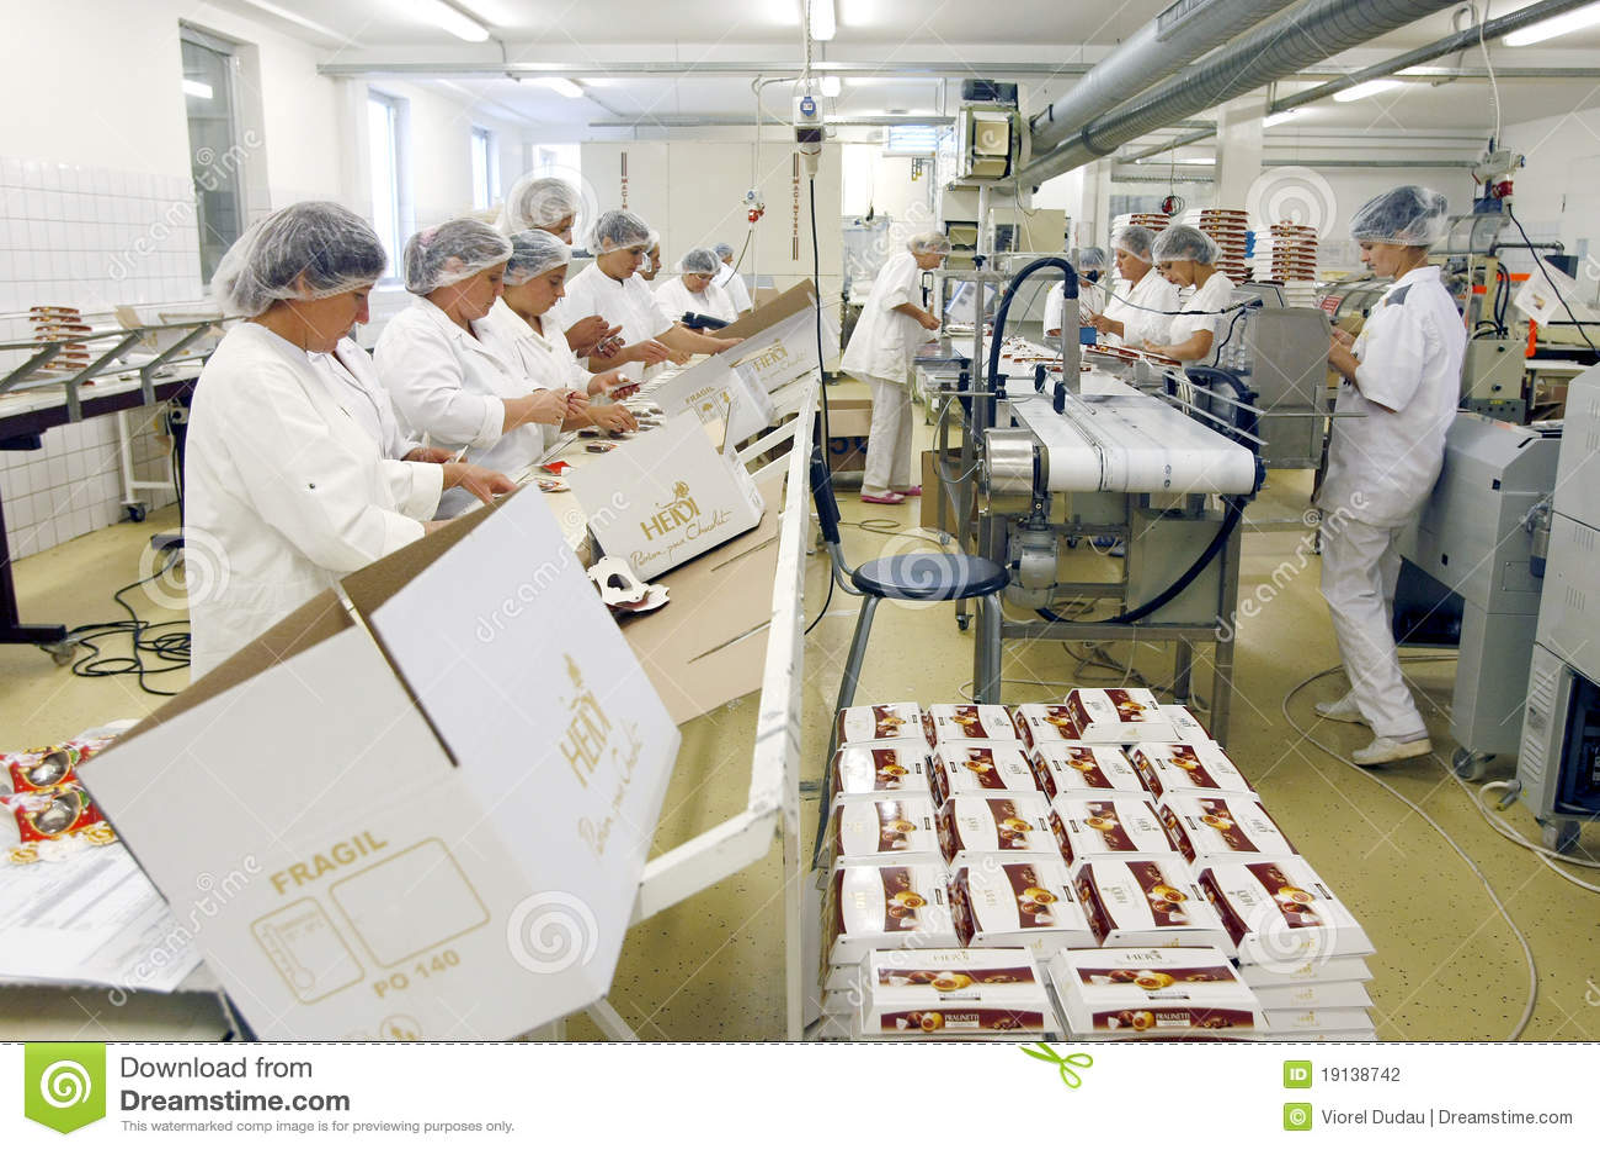 image The chocolate factory 17 my girl gotta girlfriend